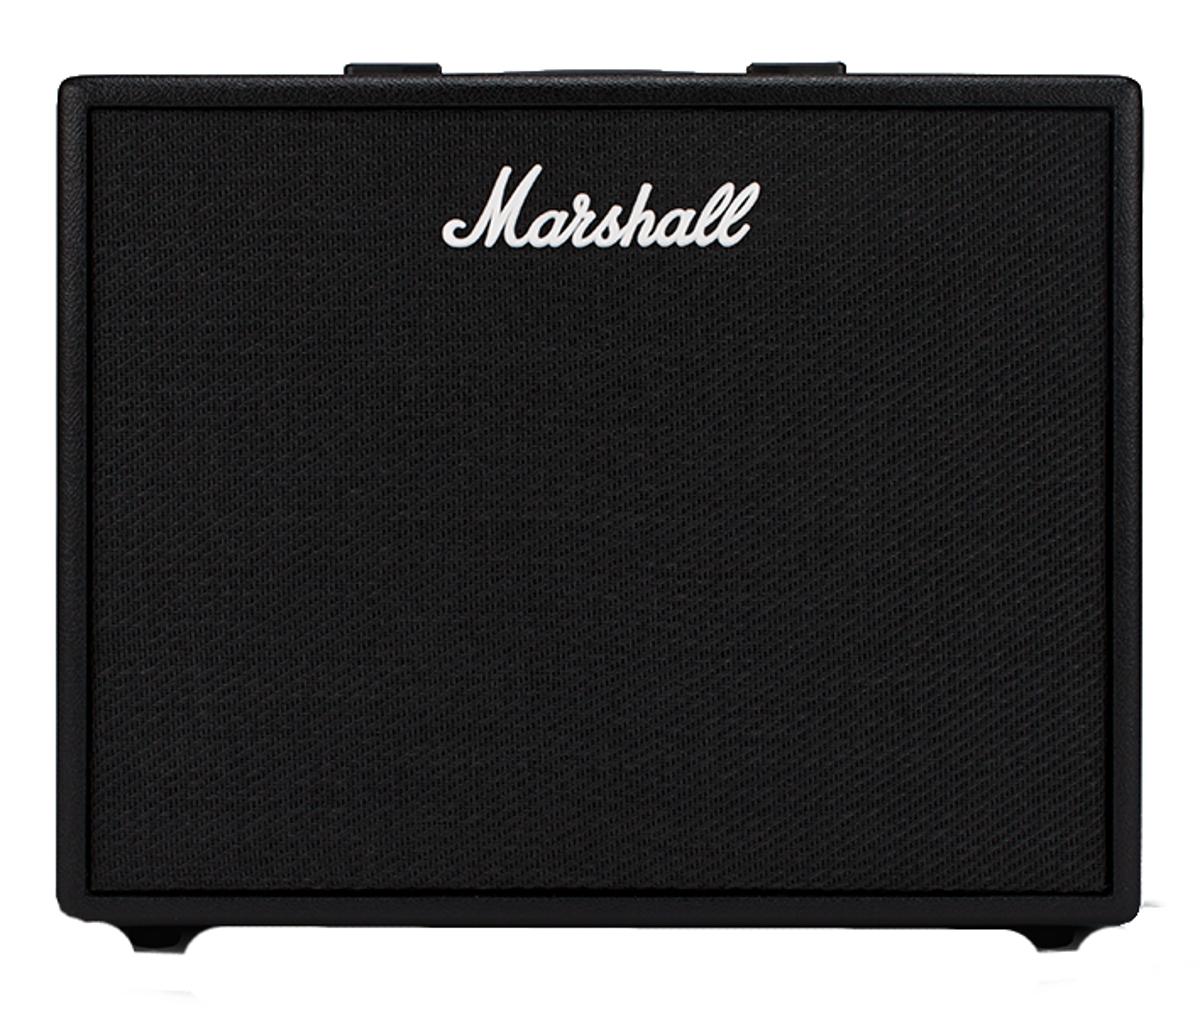 "50 Watt Combo Amplifier with 12"" Speaker"